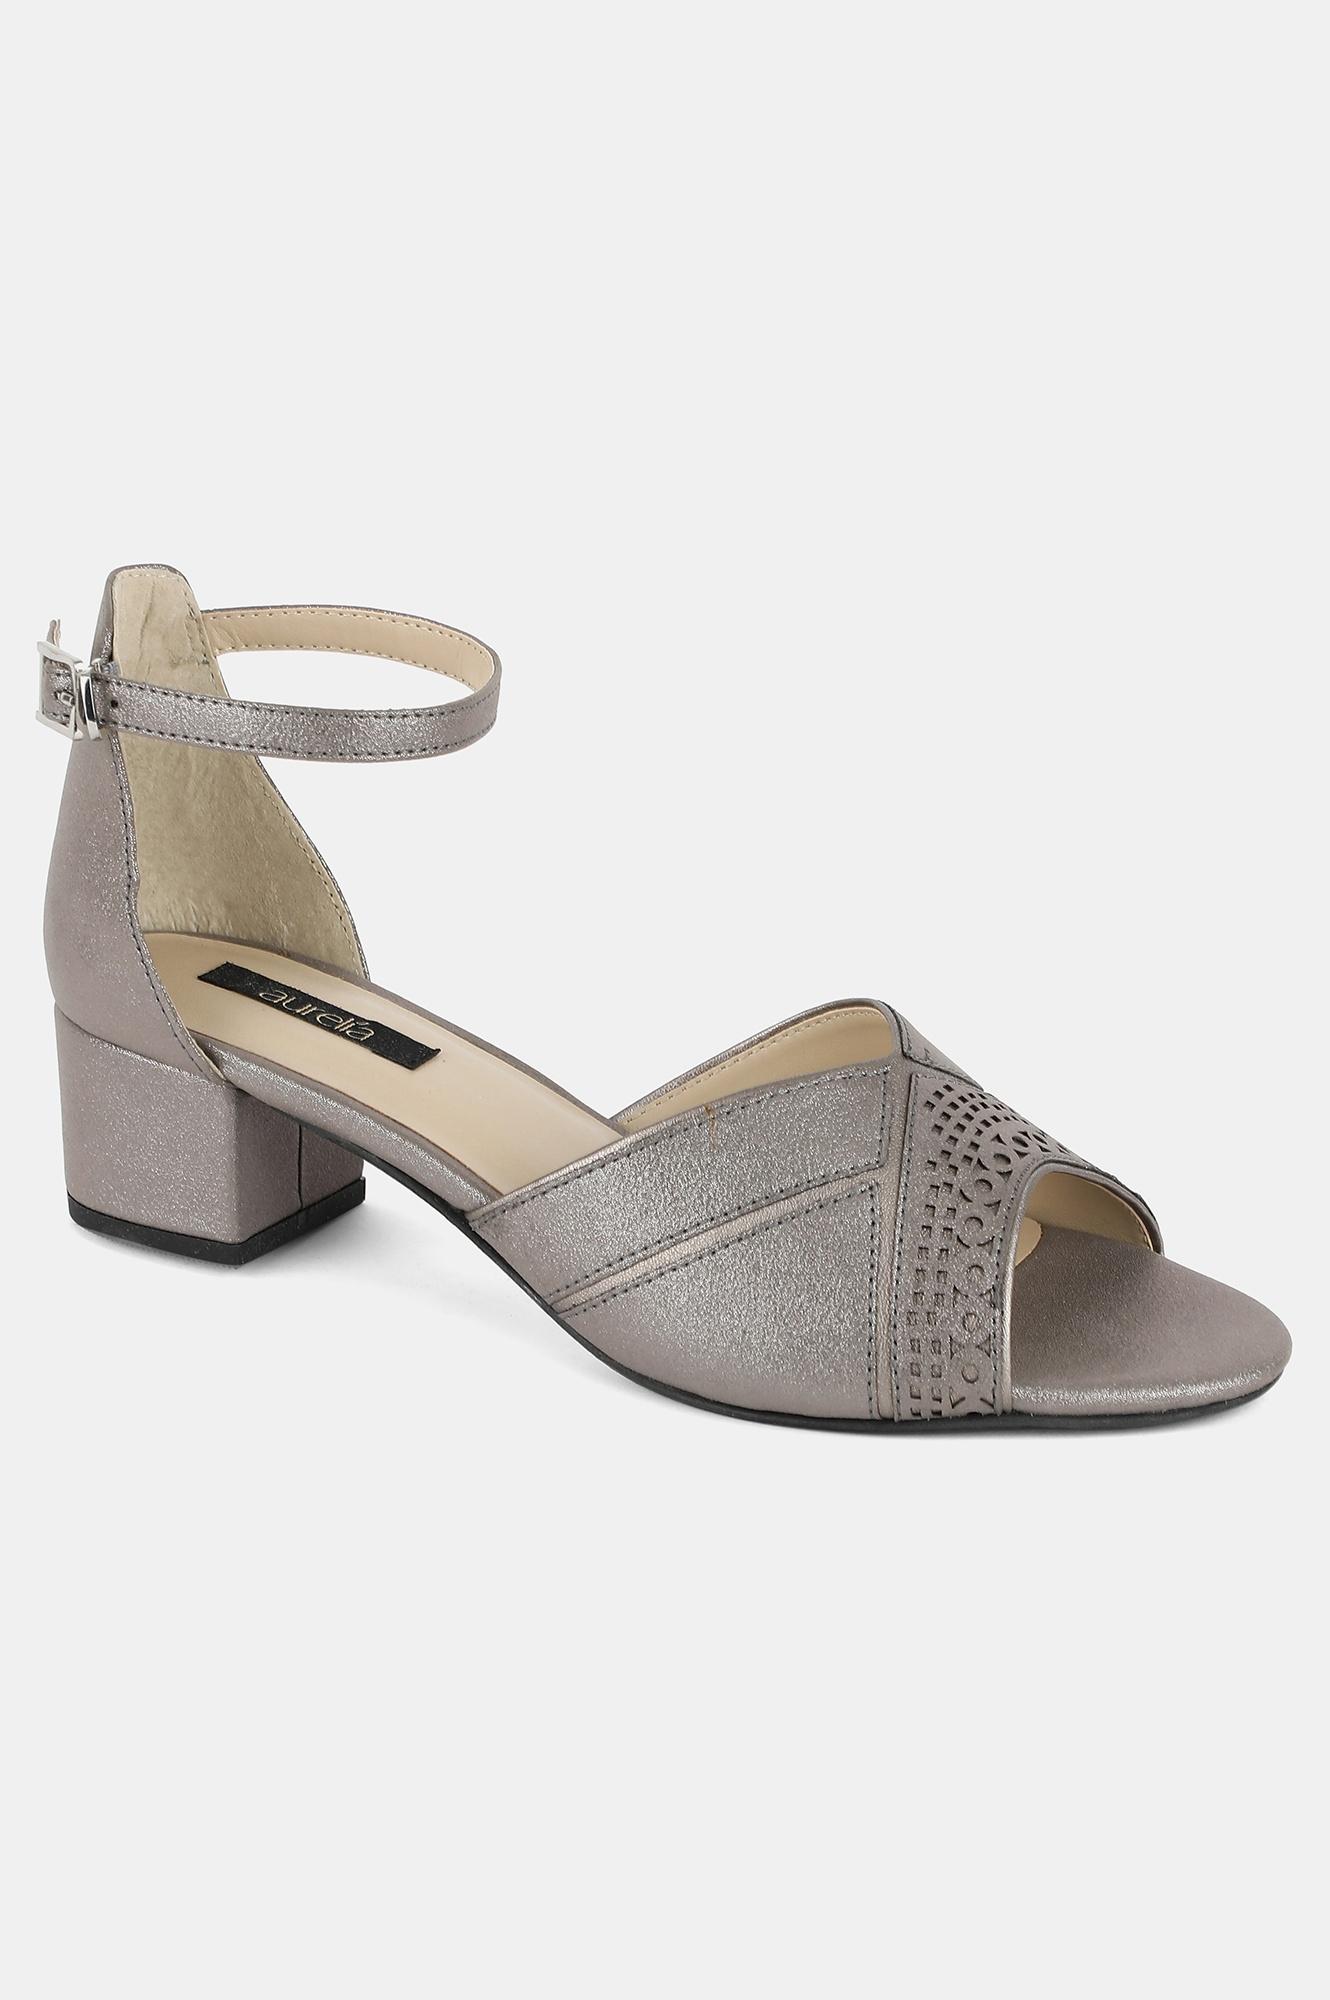 Aurelia | Aurelia Pewter Almond Toe Laser Cut Block Heel